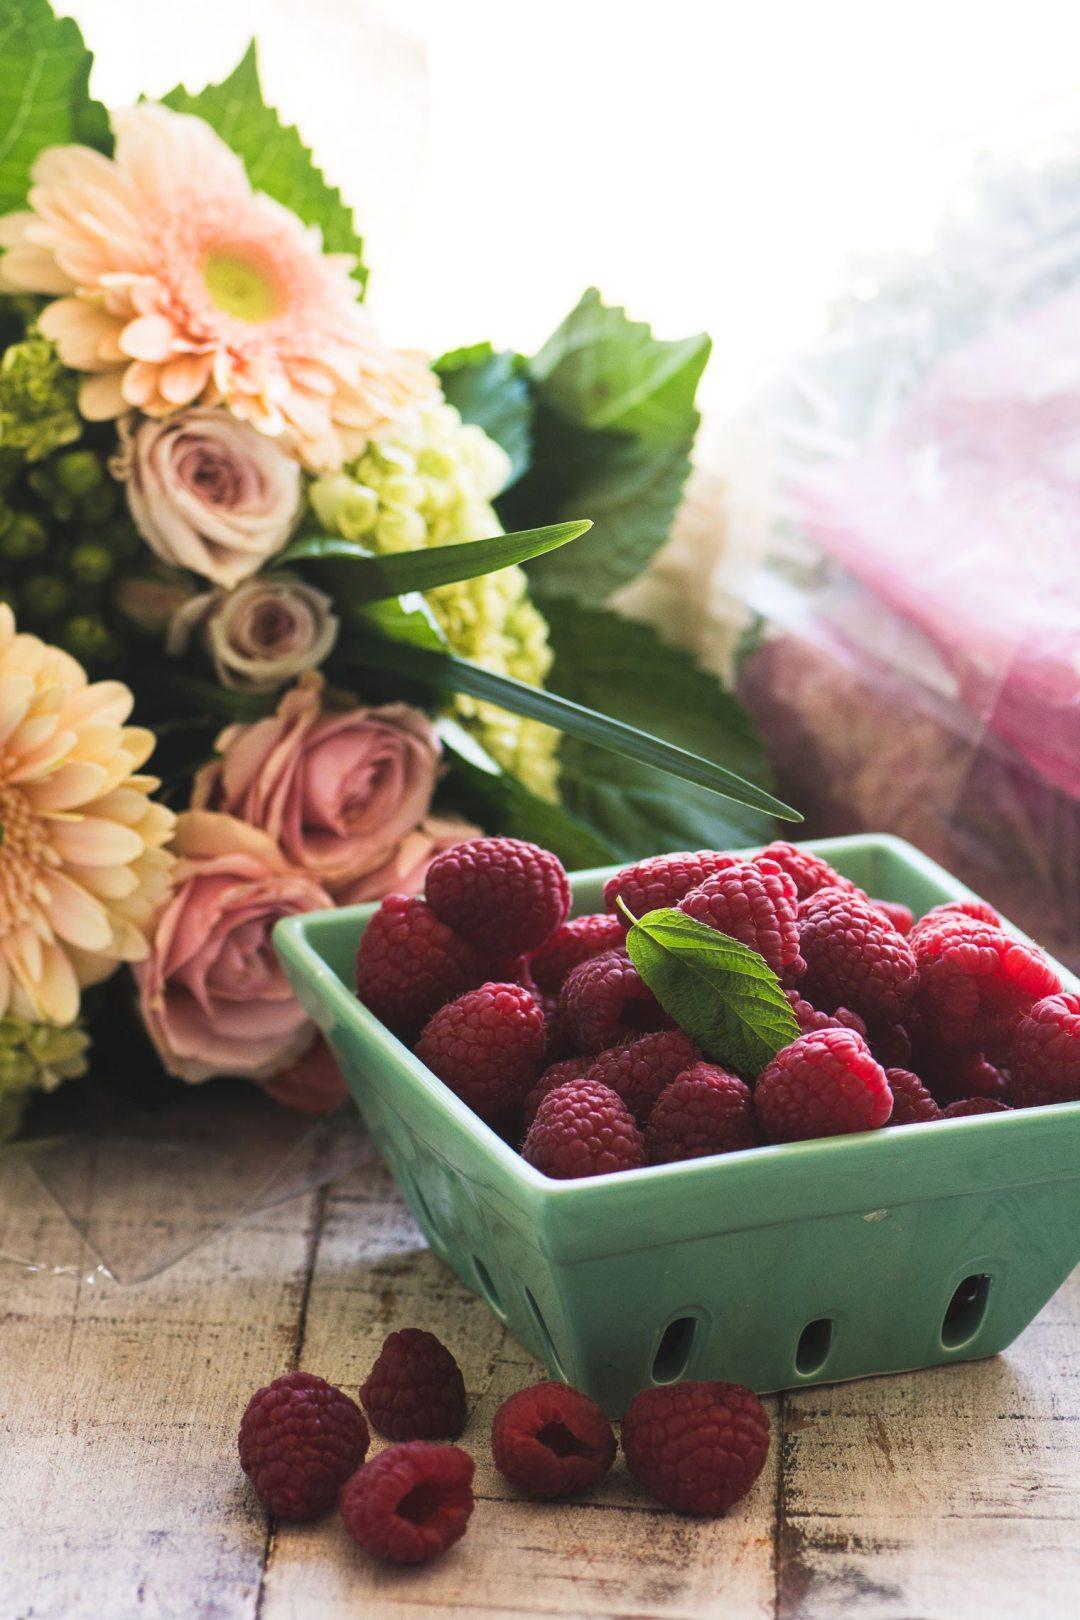 fresh flowers and raspberries